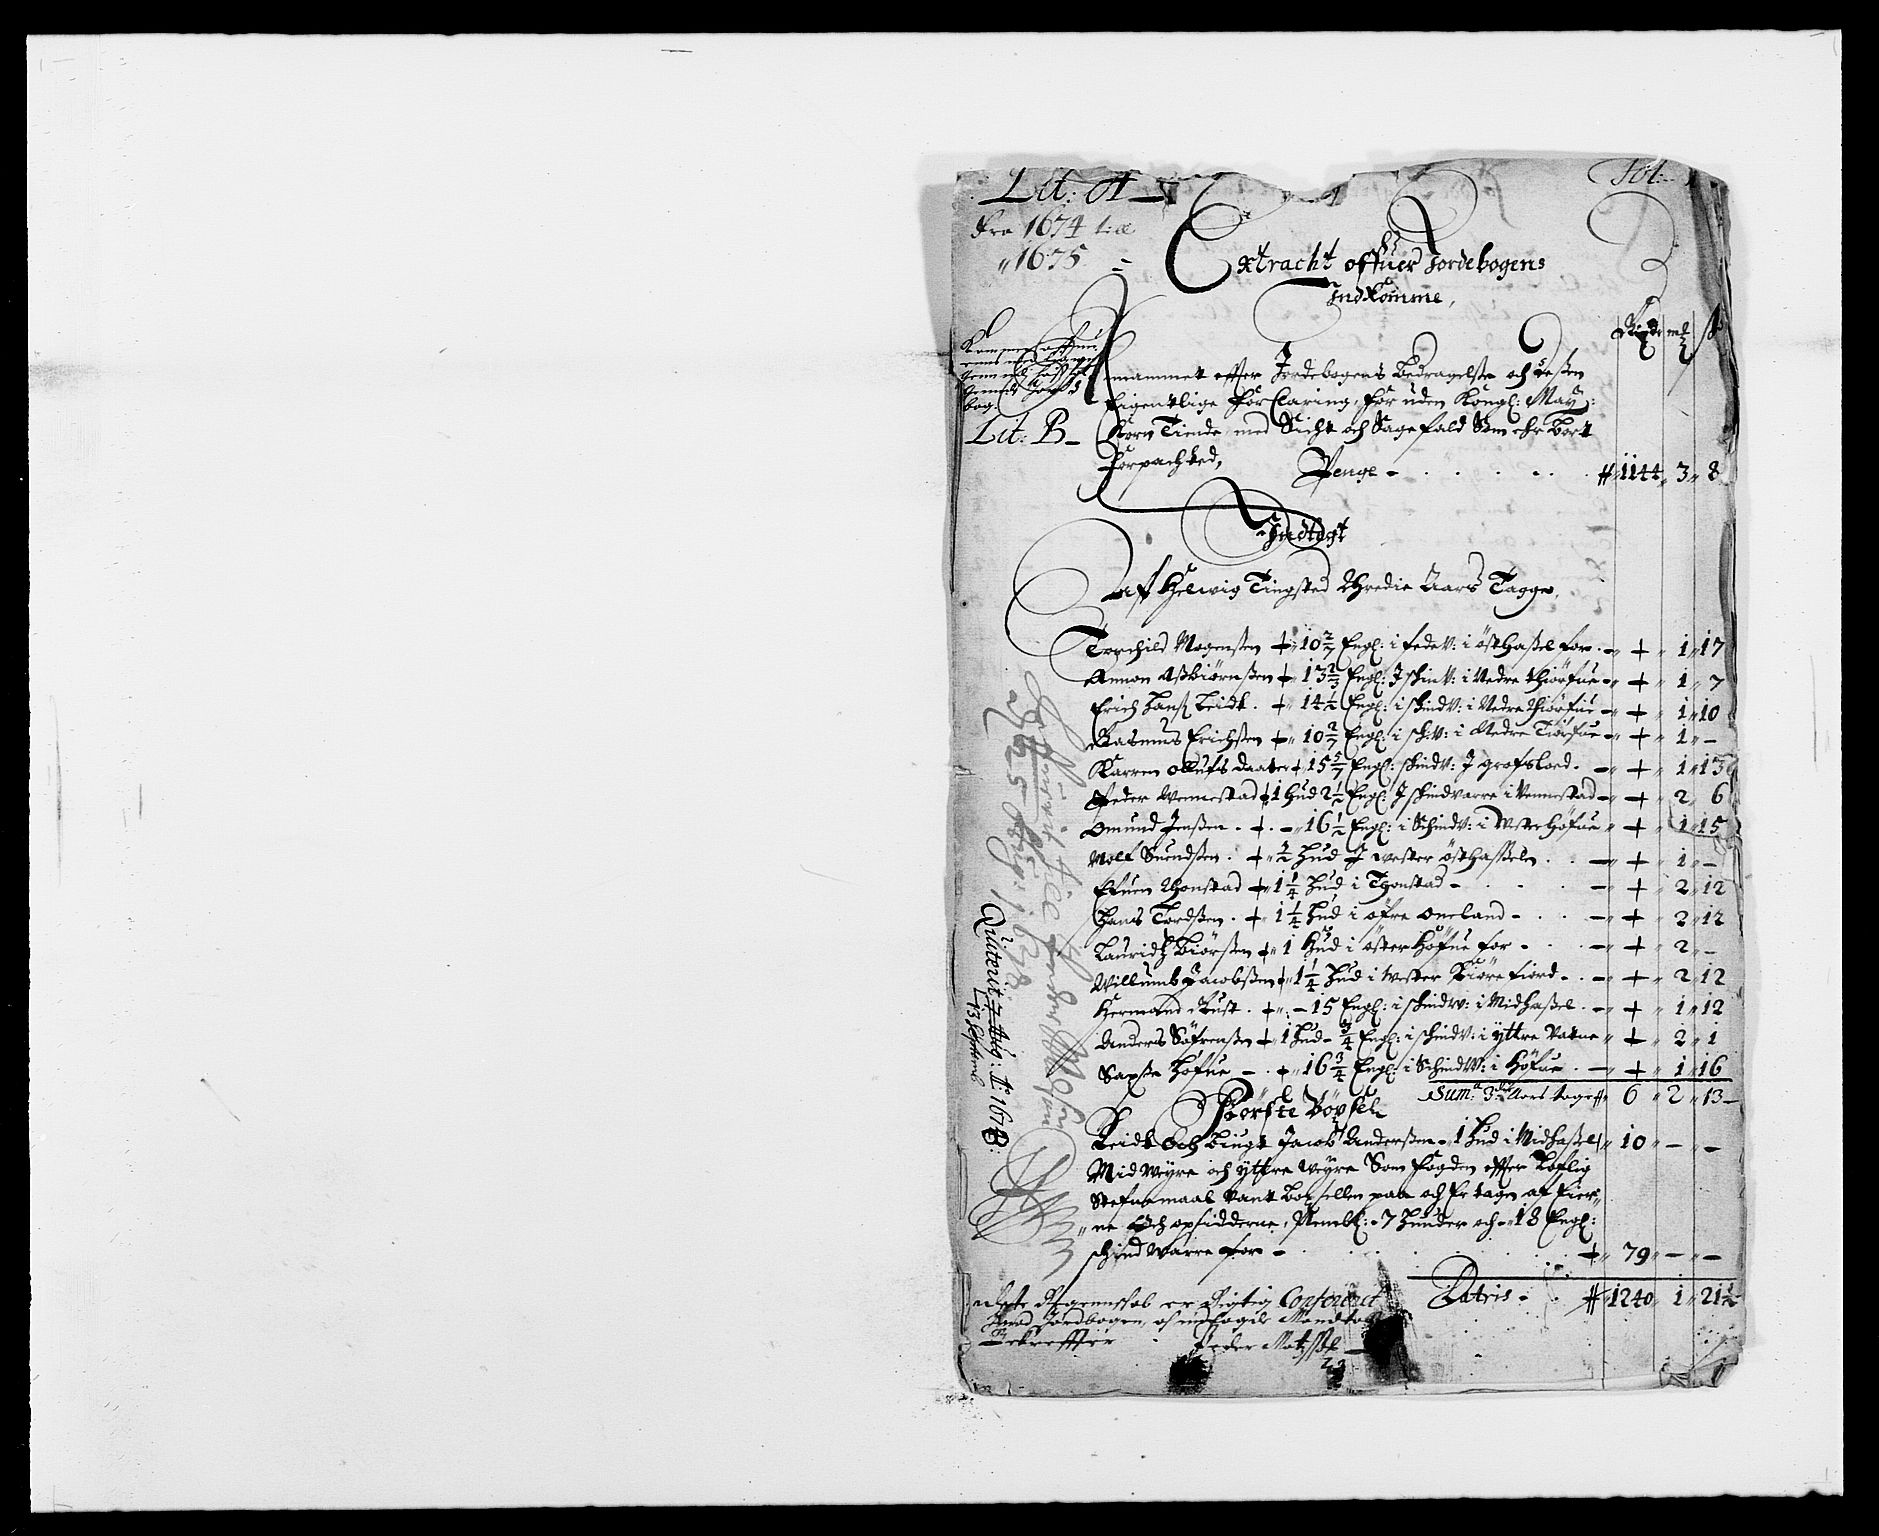 RA, Rentekammeret inntil 1814, Reviderte regnskaper, Fogderegnskap, R41/L2528: Fogderegnskap Lista, 1673-1674, s. 188